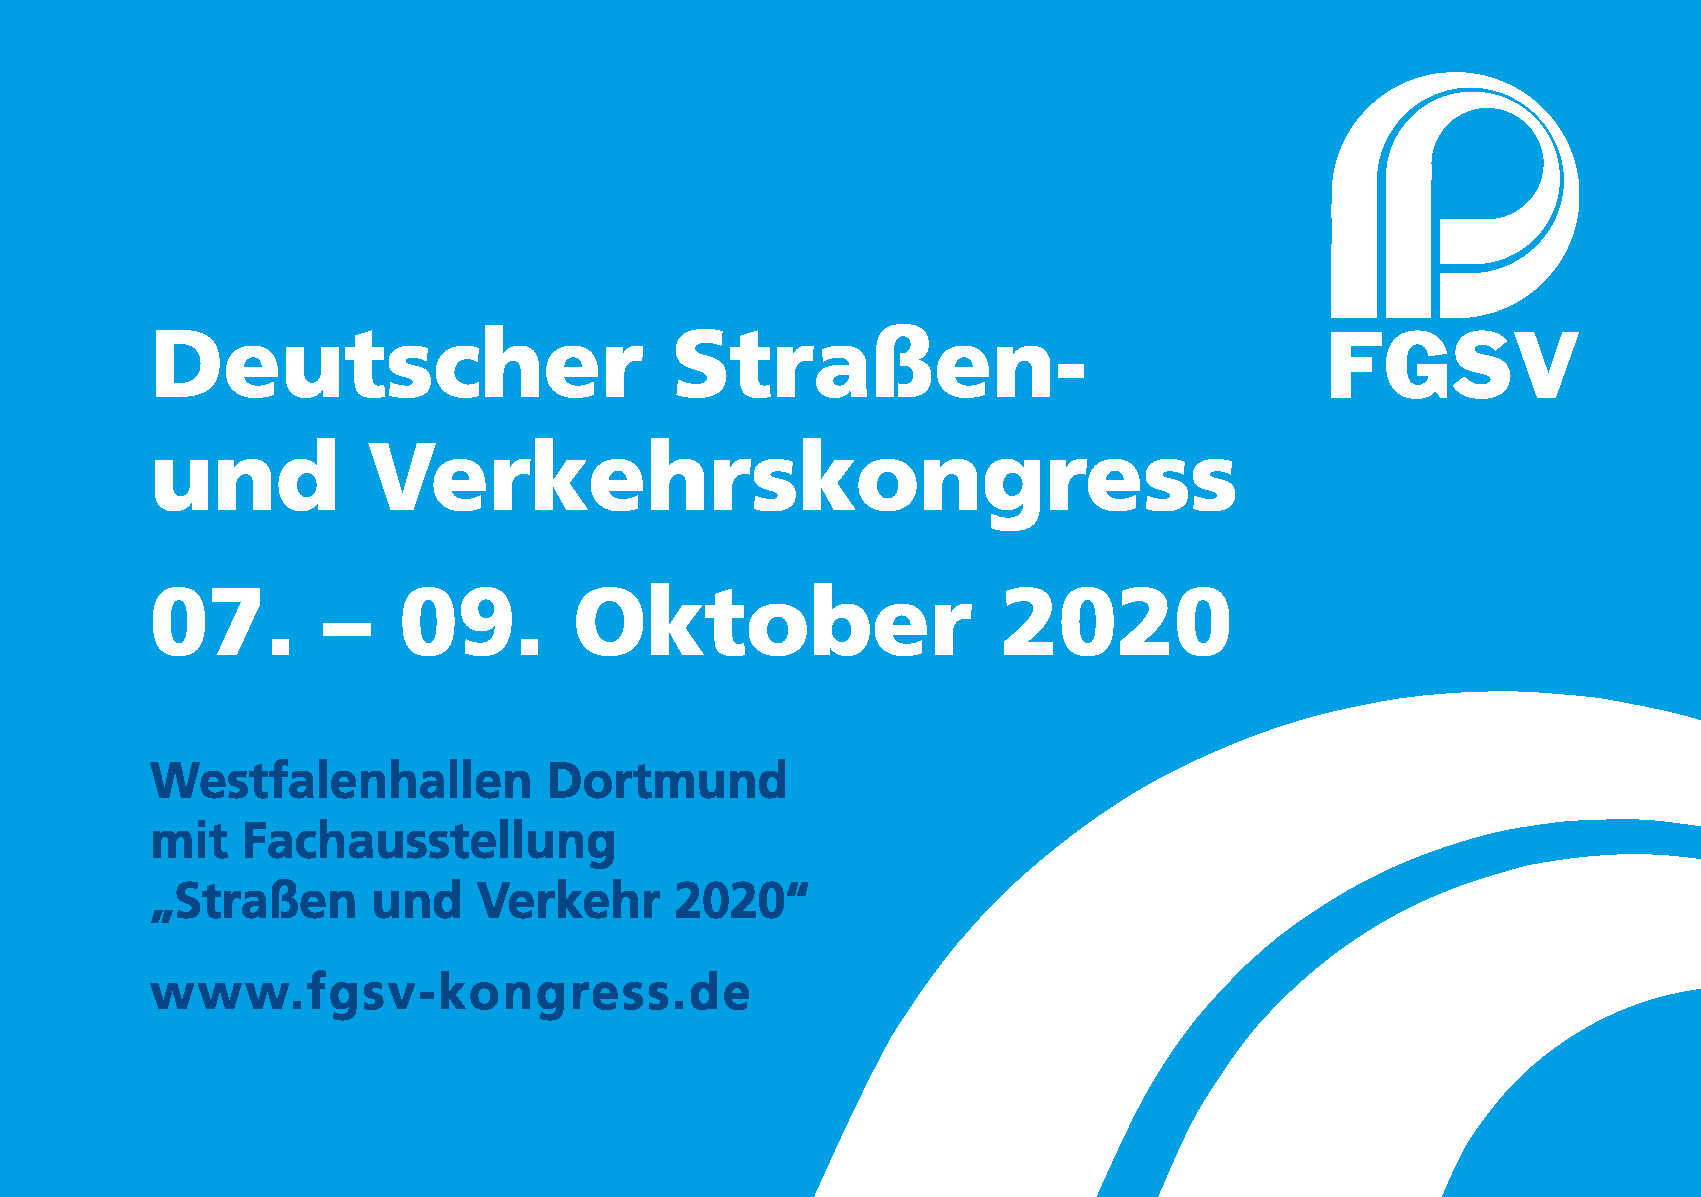 FGSV Kongress 2020